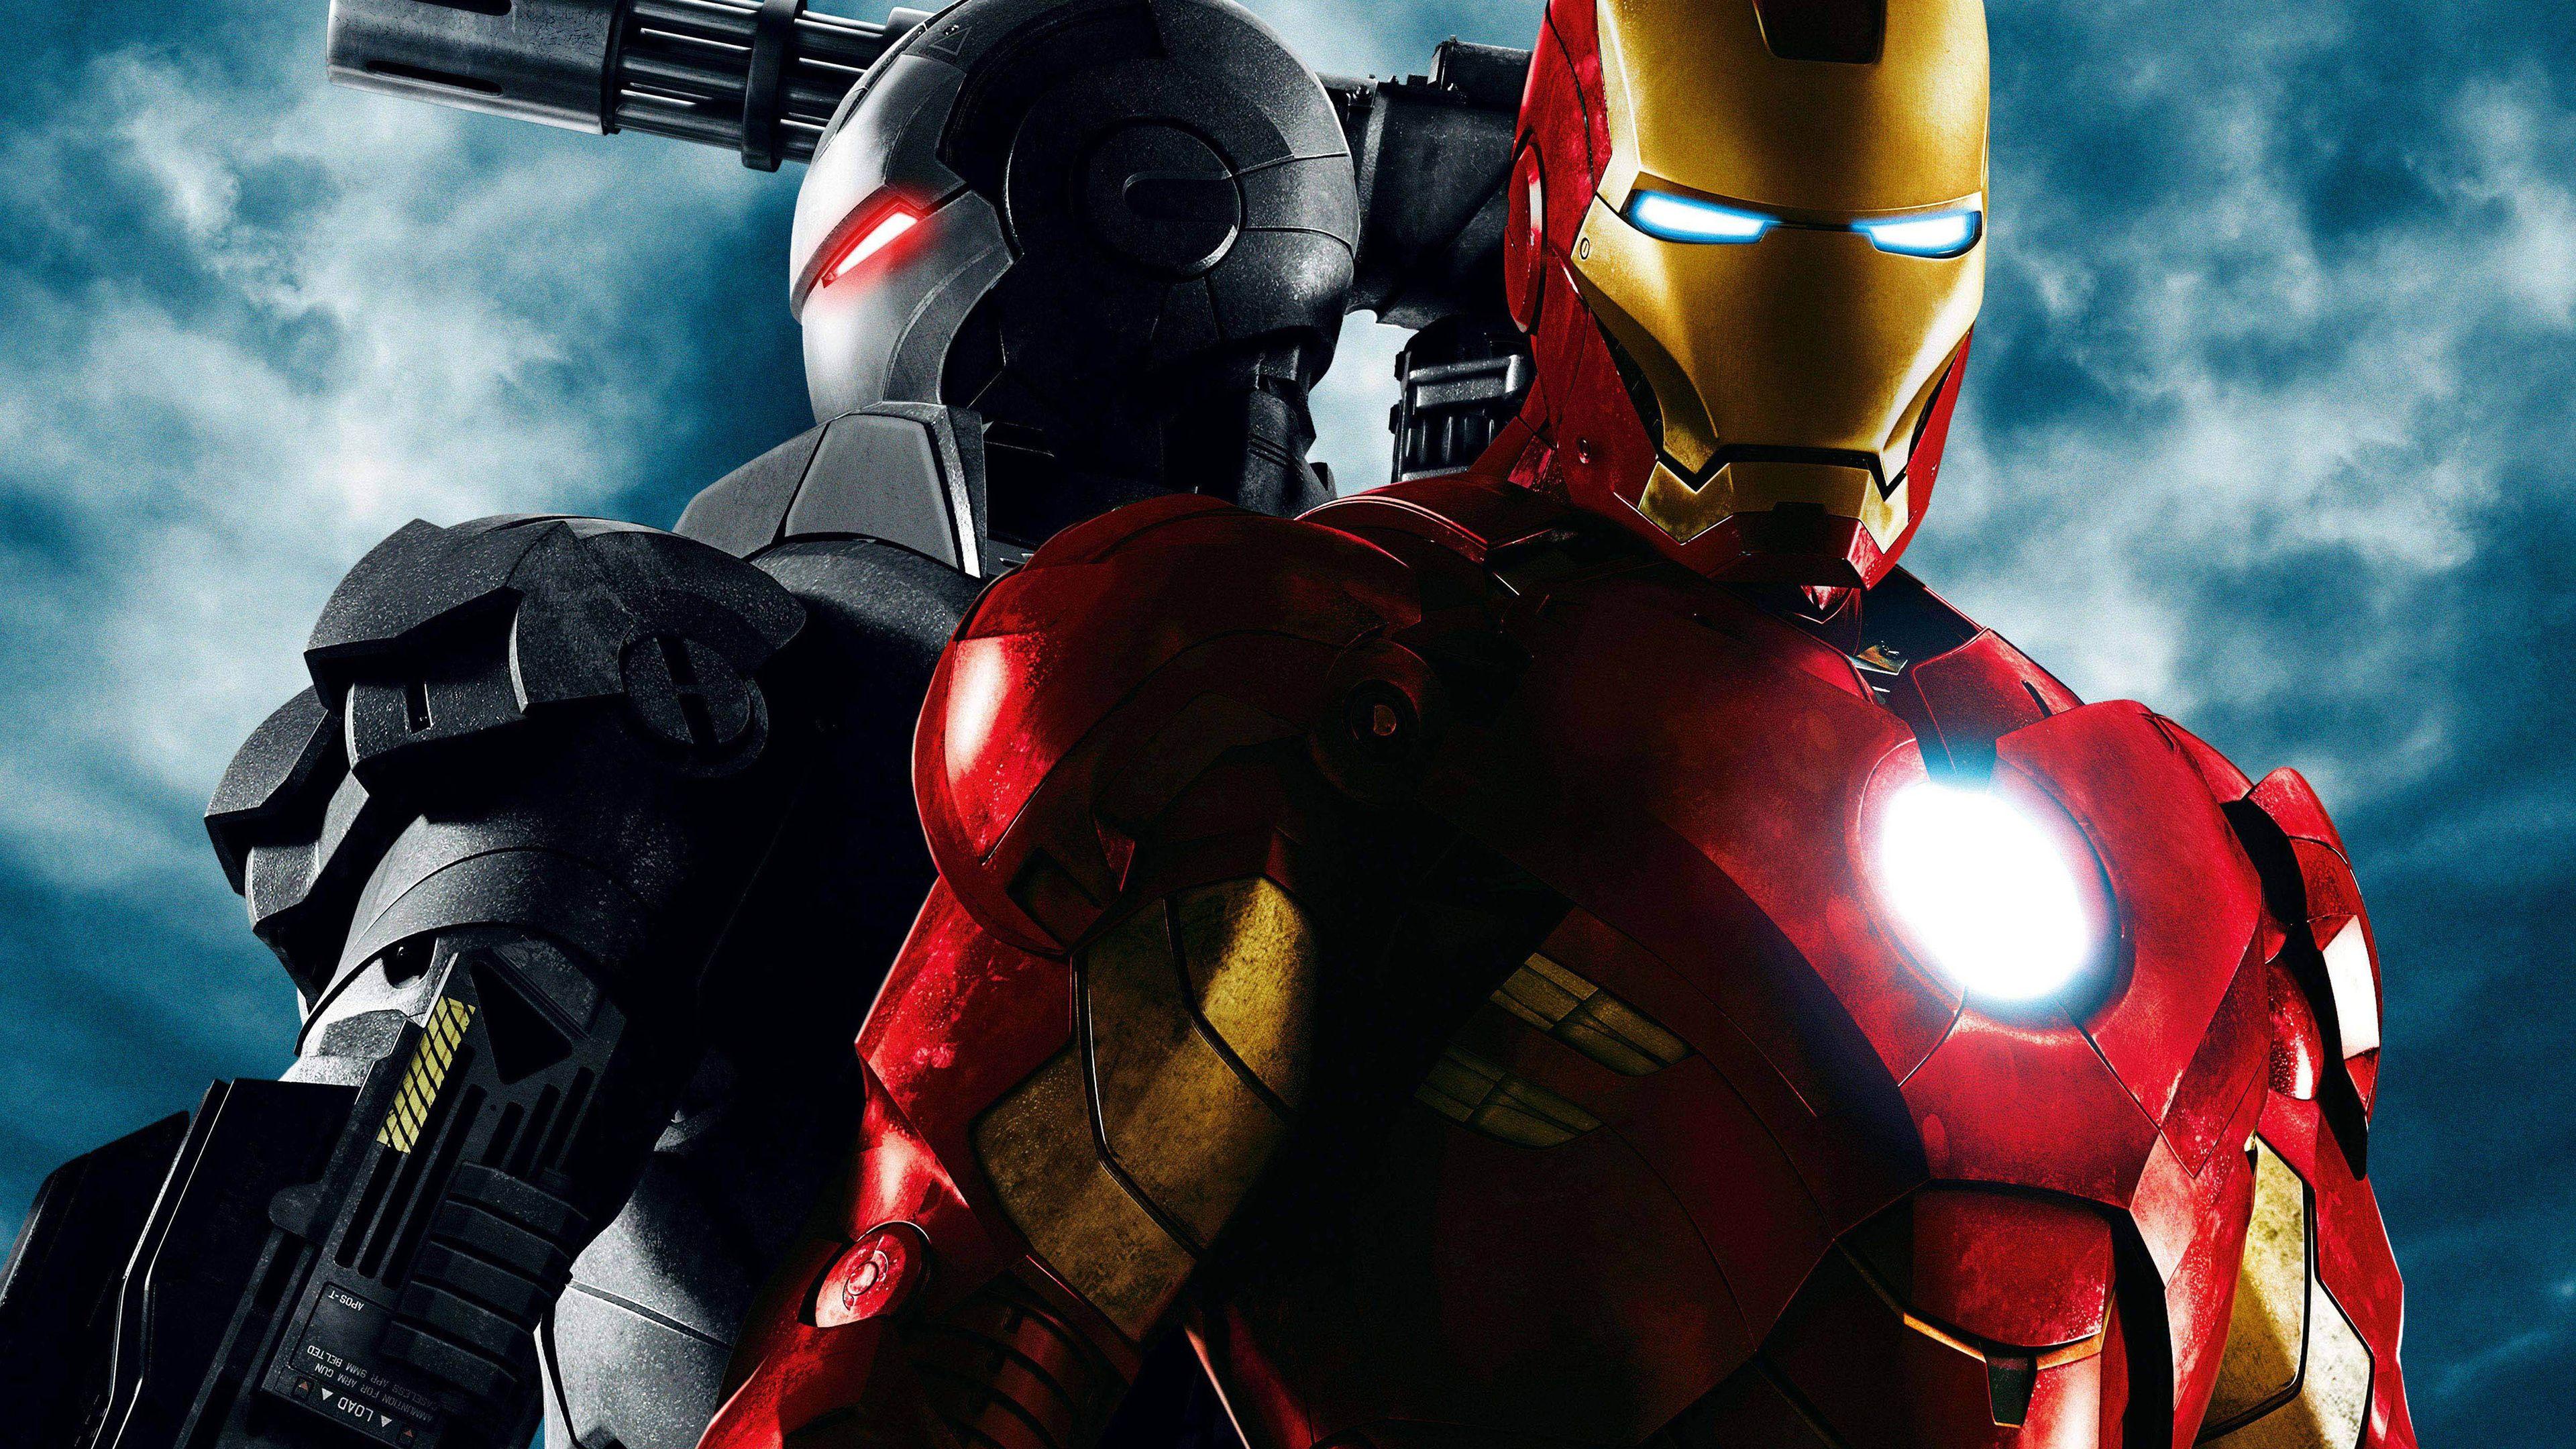 Iron Man 2 4k Superheroes Wallpapers Movies Wallpapers Iron Man Wallpapers Hd Wallpapers 4k Wallpapers Iron Man Wallpapers Superhero Iron Man